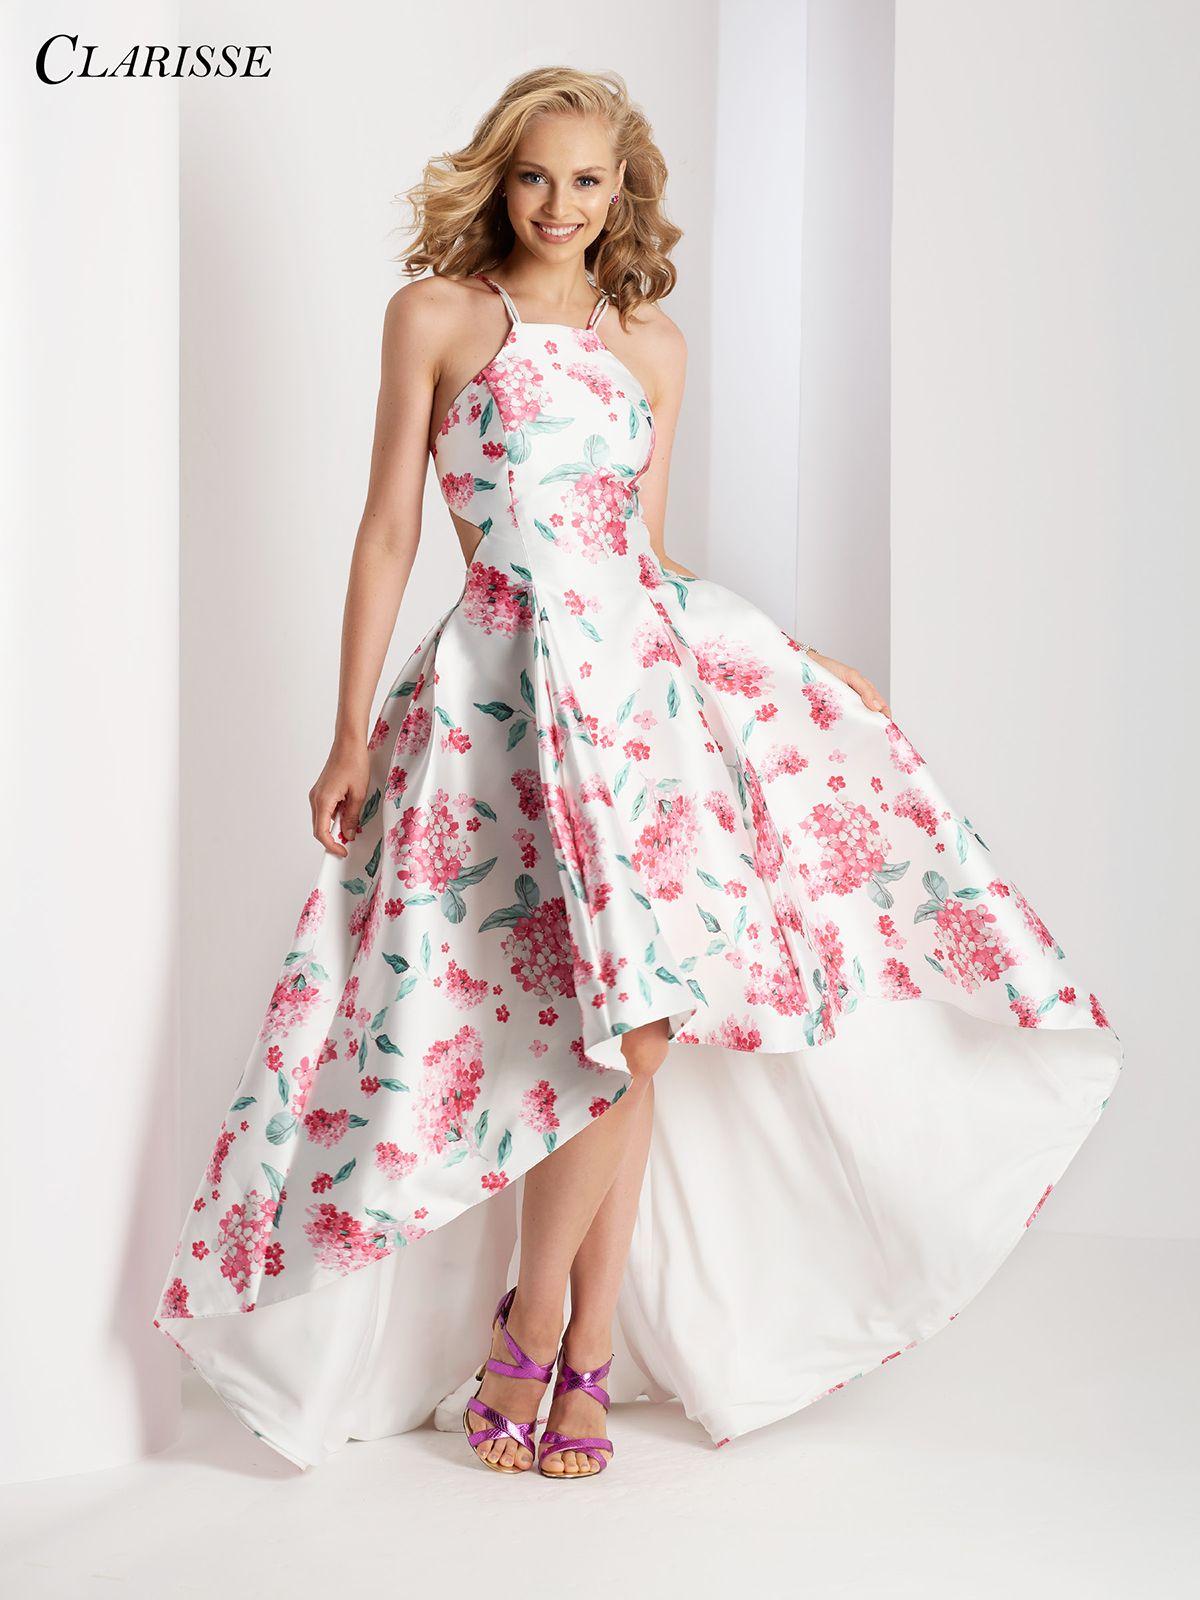 Halter High Low Floral Prom Dress 3564   Floral prom dresses, High ...